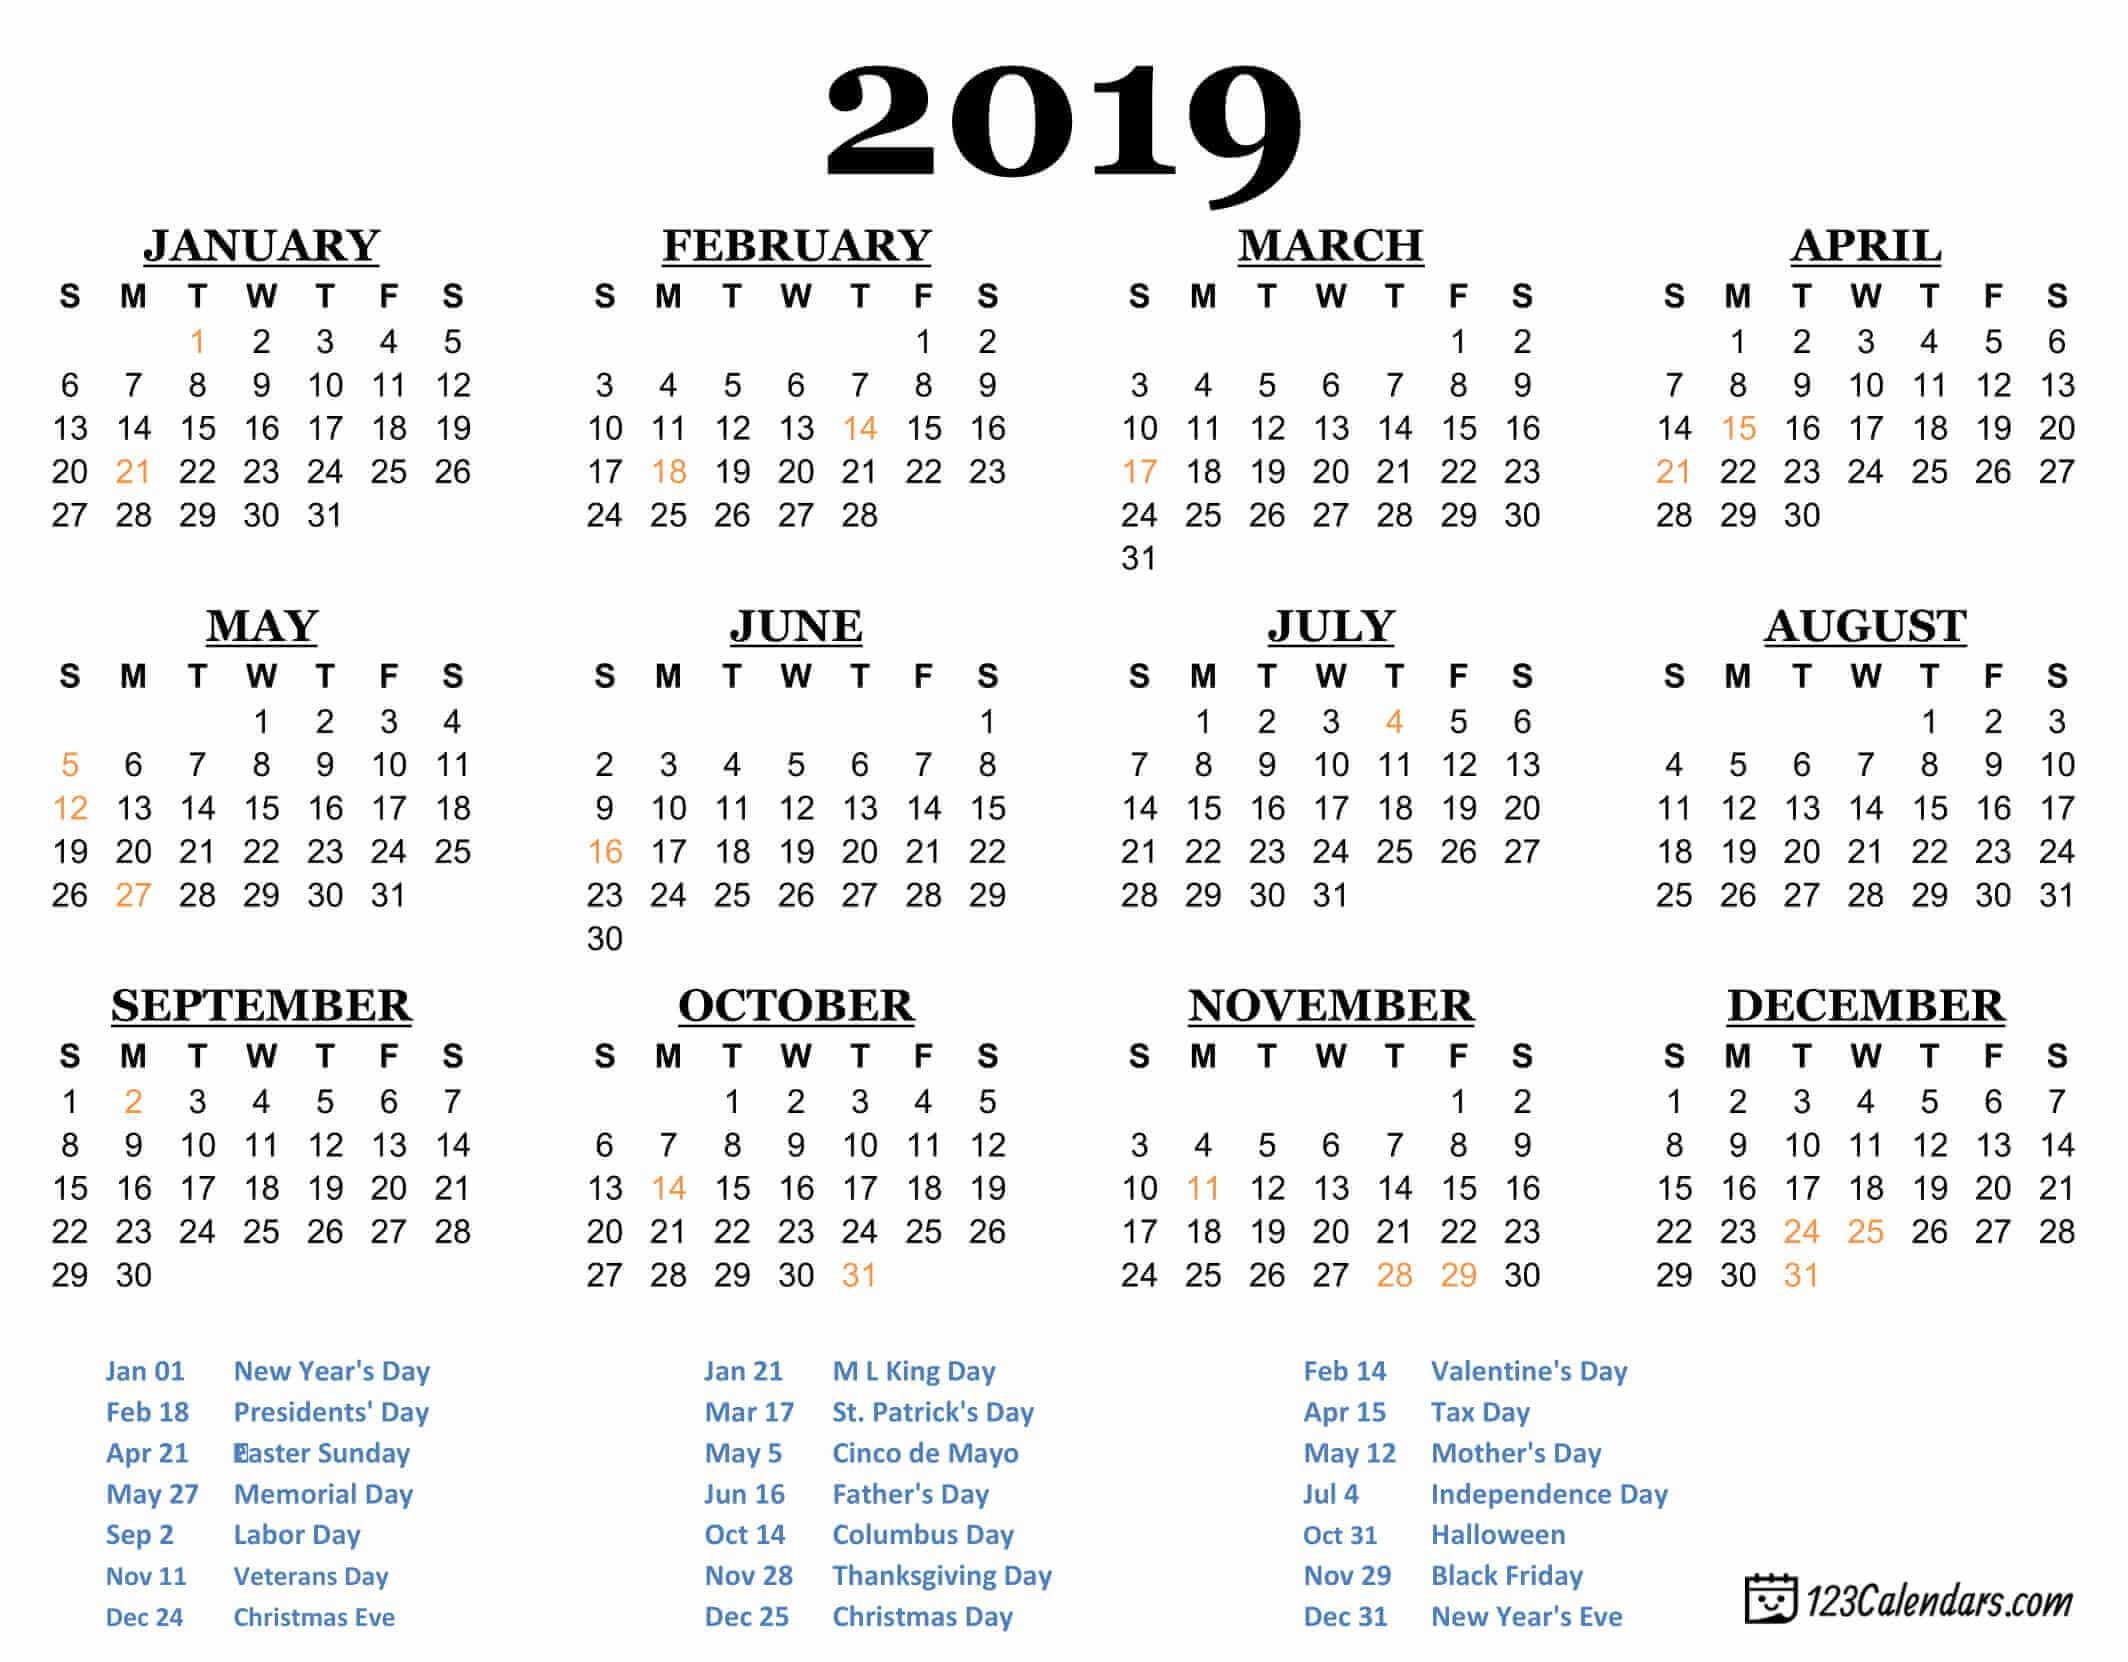 Printable 2019 Calendars Free Printable 2019 Calendar